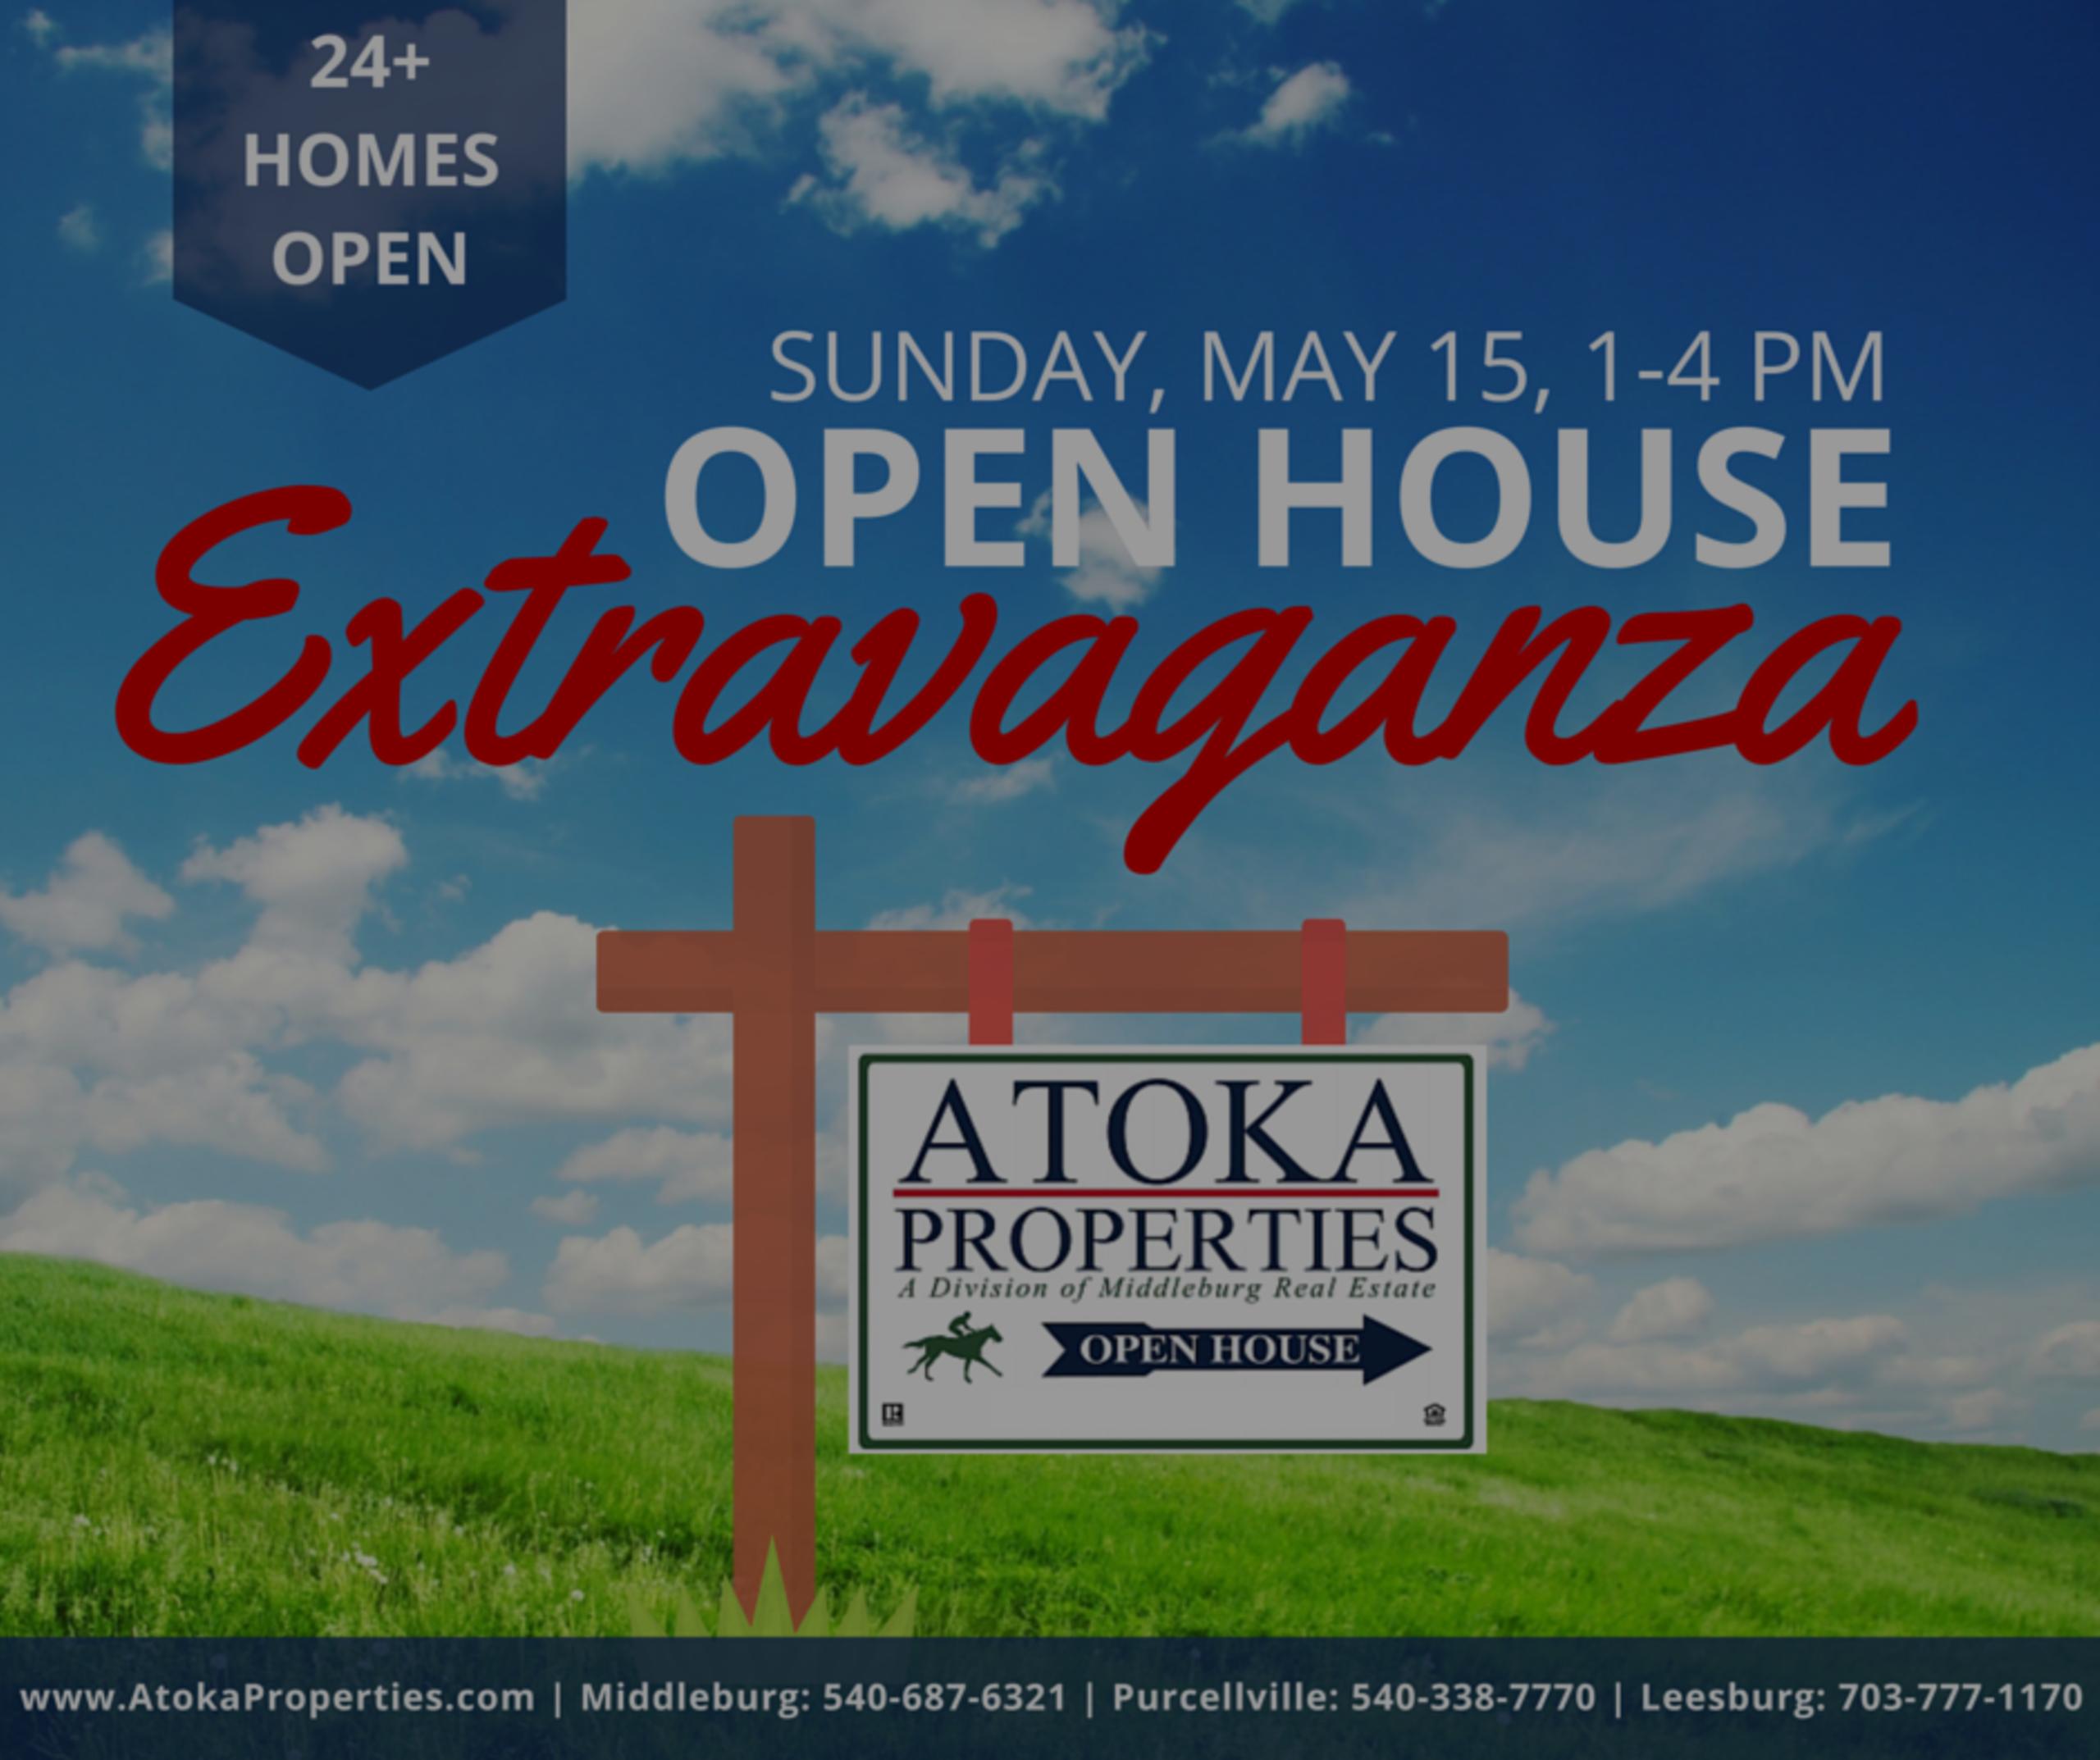 Open House Extravaganza!